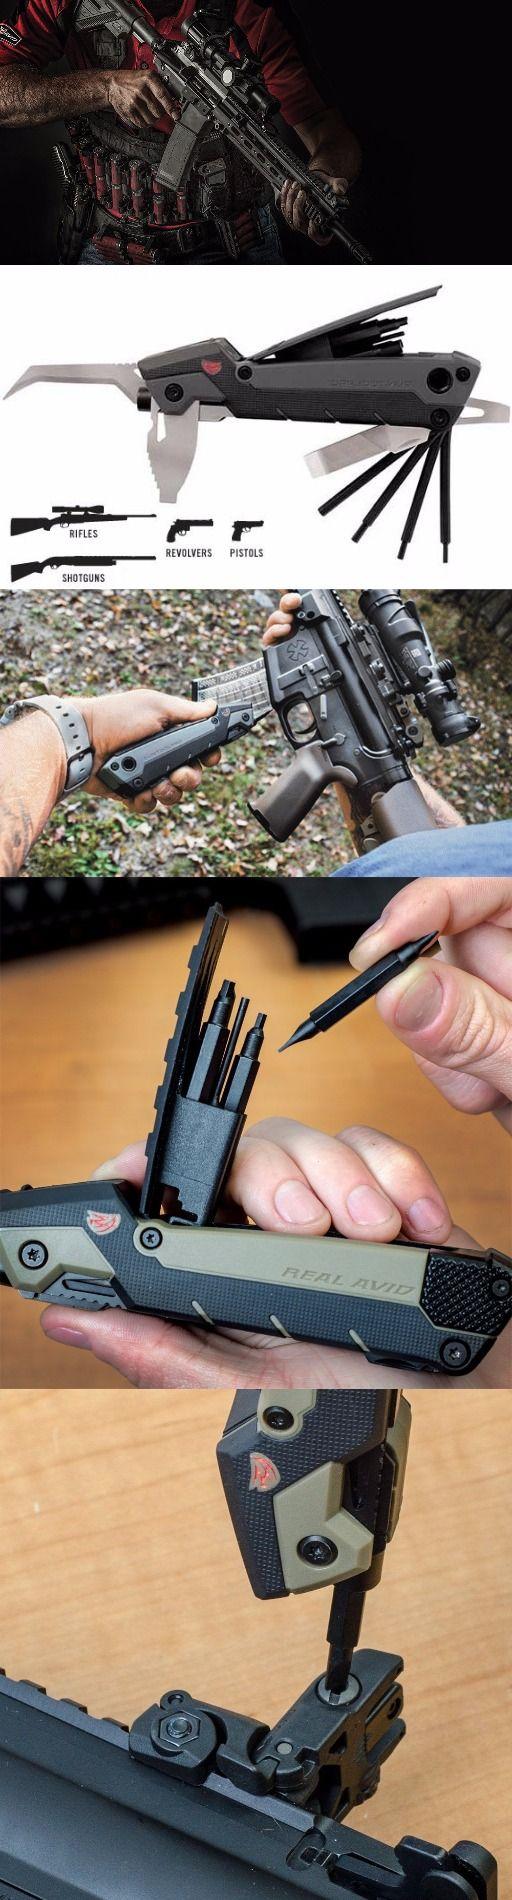 Real Avid Pro EDC Gun Tool - Everyday Carry Gear